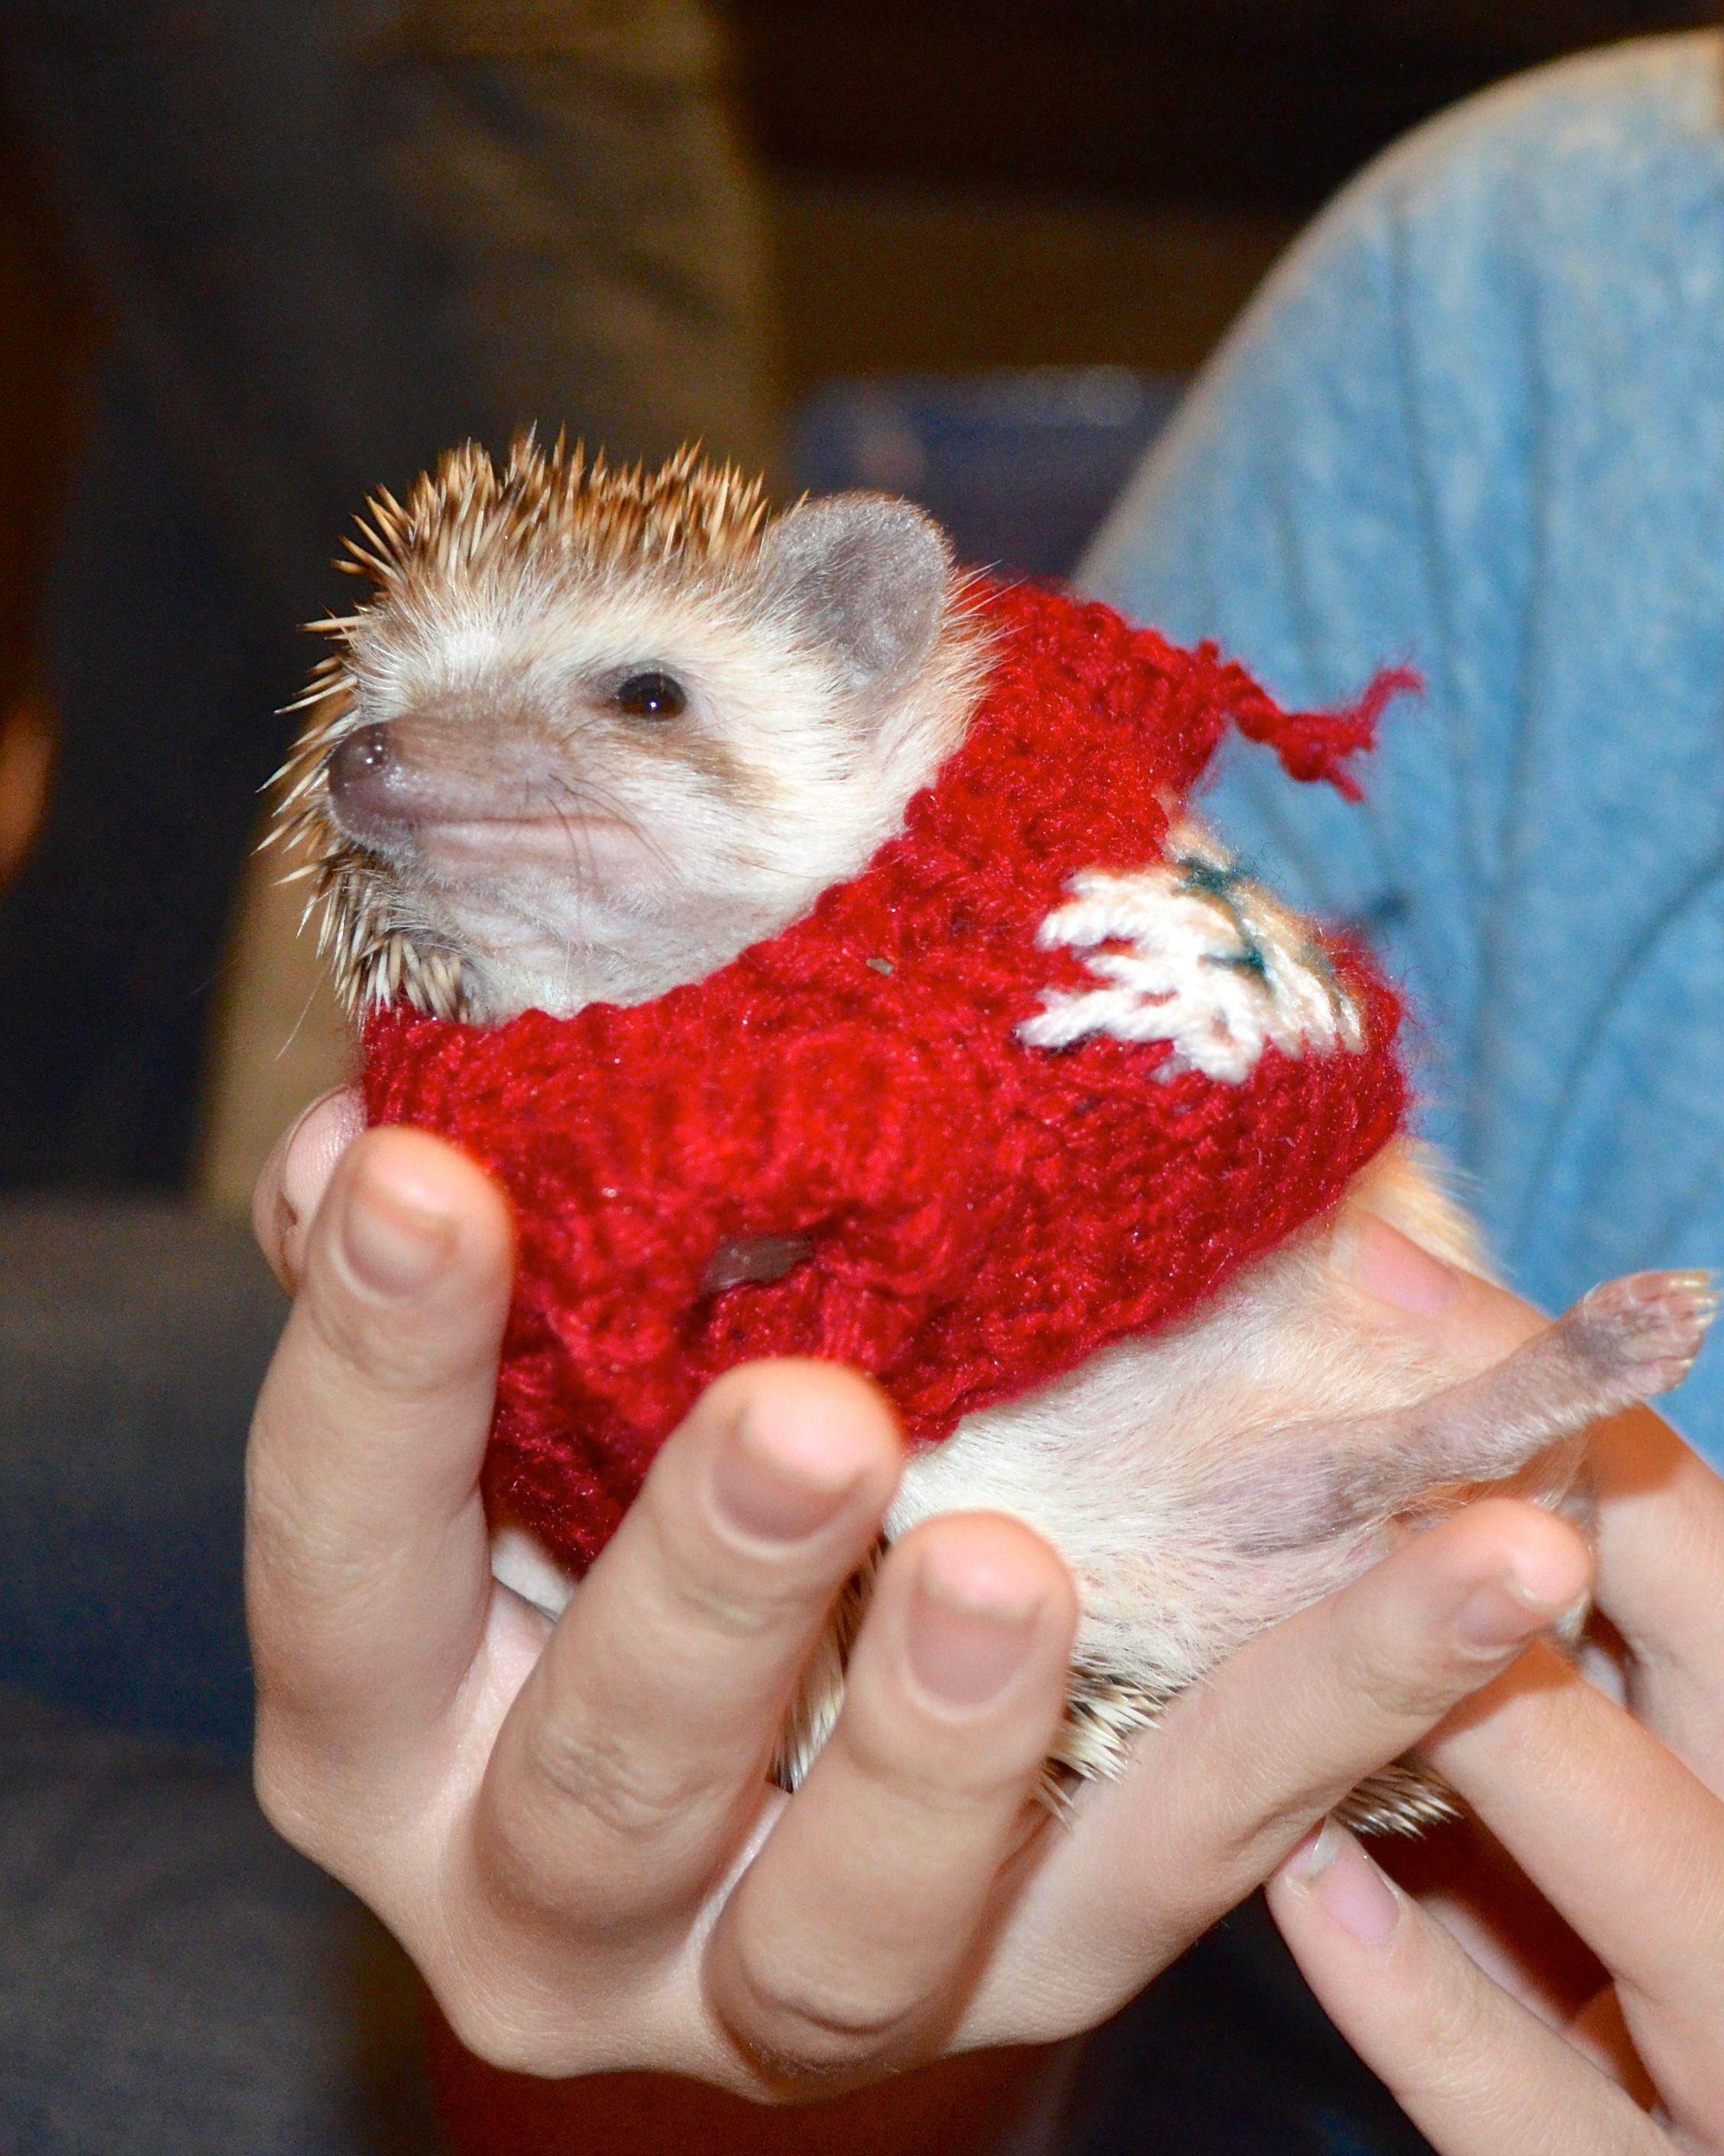 Hedgehog Christmas Jumper.The Christmas Sweater The Pleasantries Of Princess